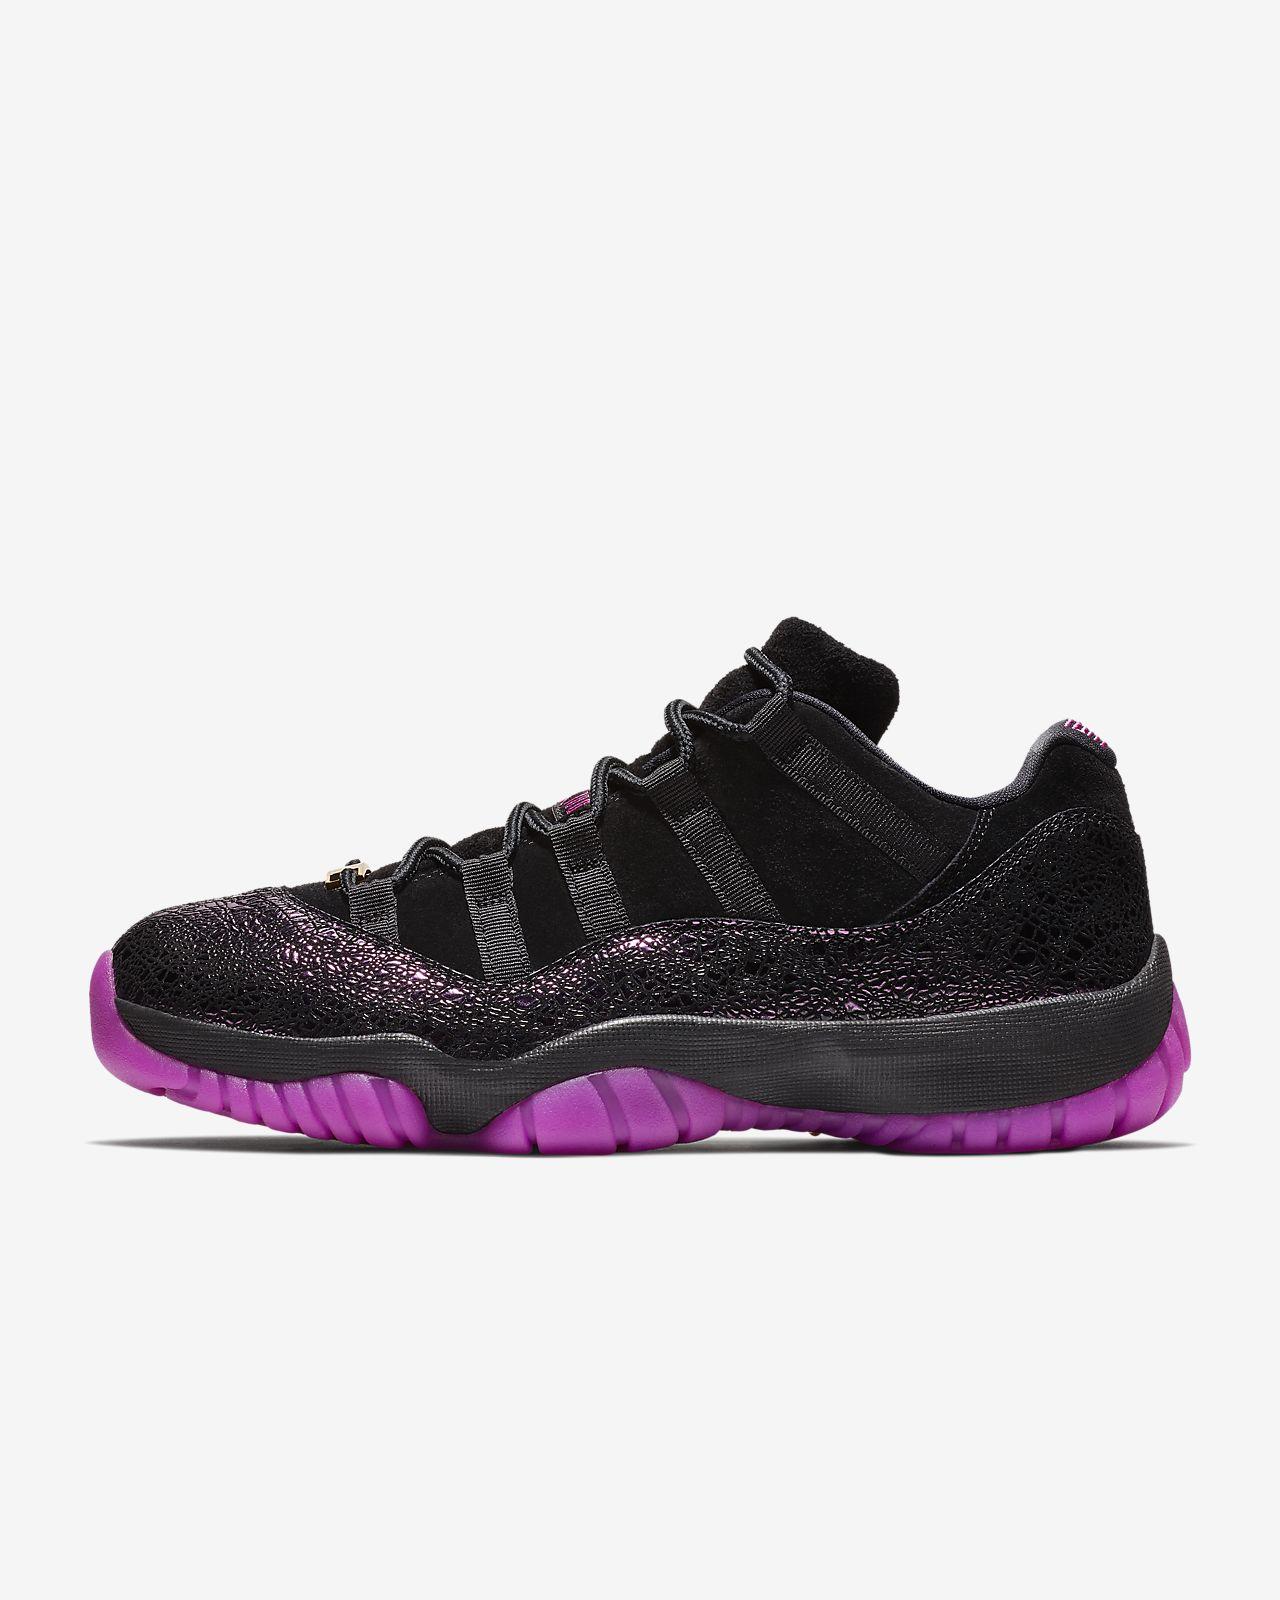 los angeles 56d8f dfacd Air Jordan 11 Low Women's Shoe